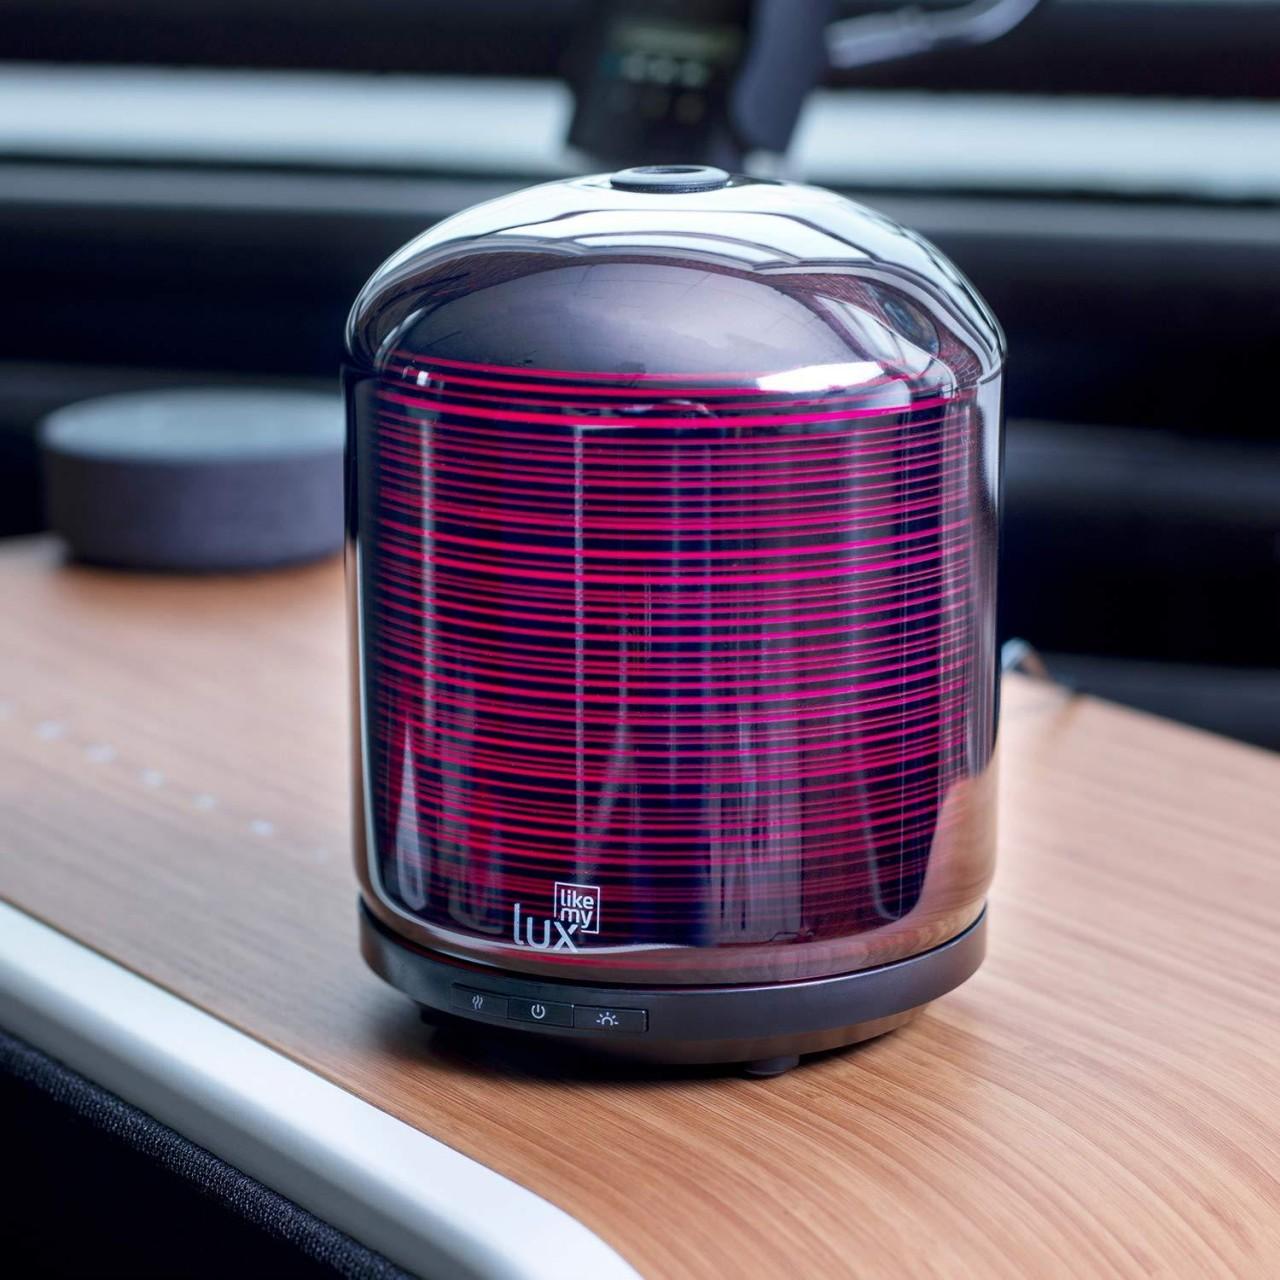 Aroma Diffuser Likemylux 200ml Luftbefeuchter Ultraschall Modern Style Grau